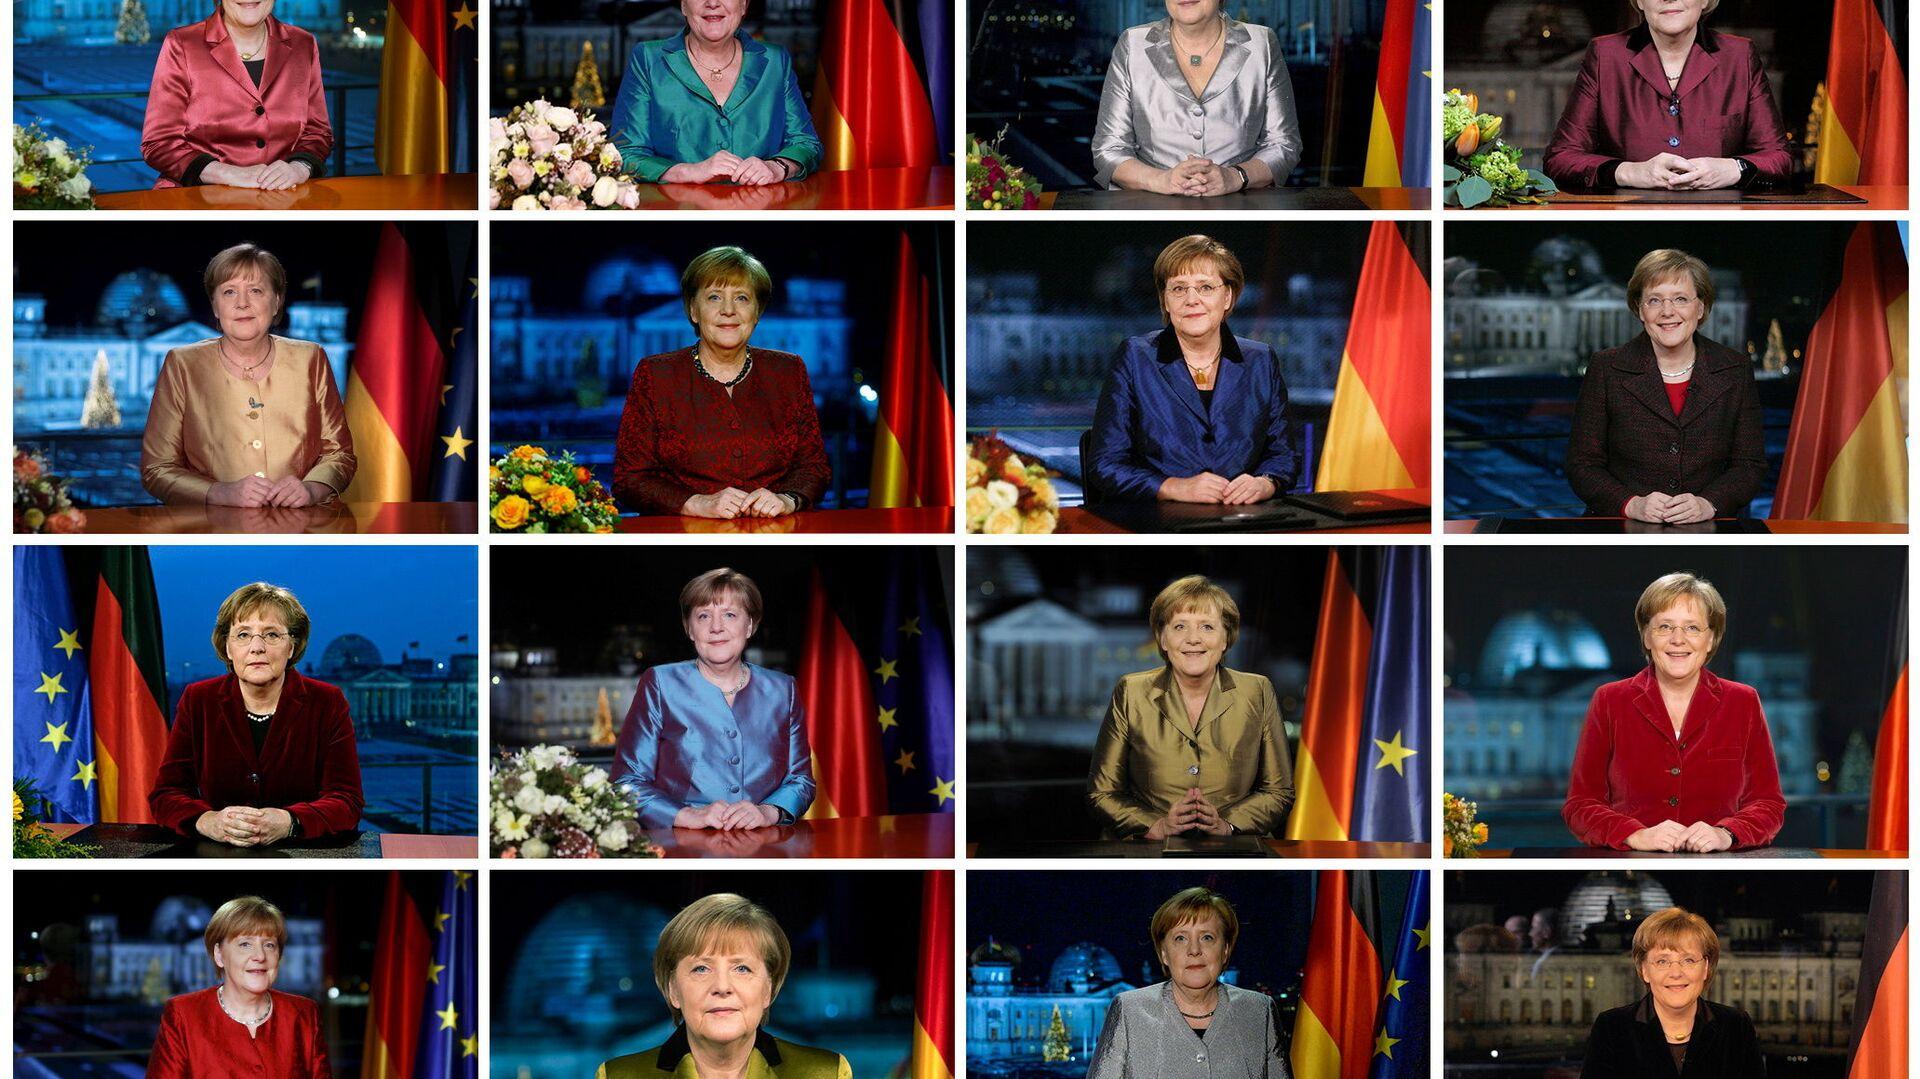 Angela Merkel - SNA, 1920, 24.09.2021